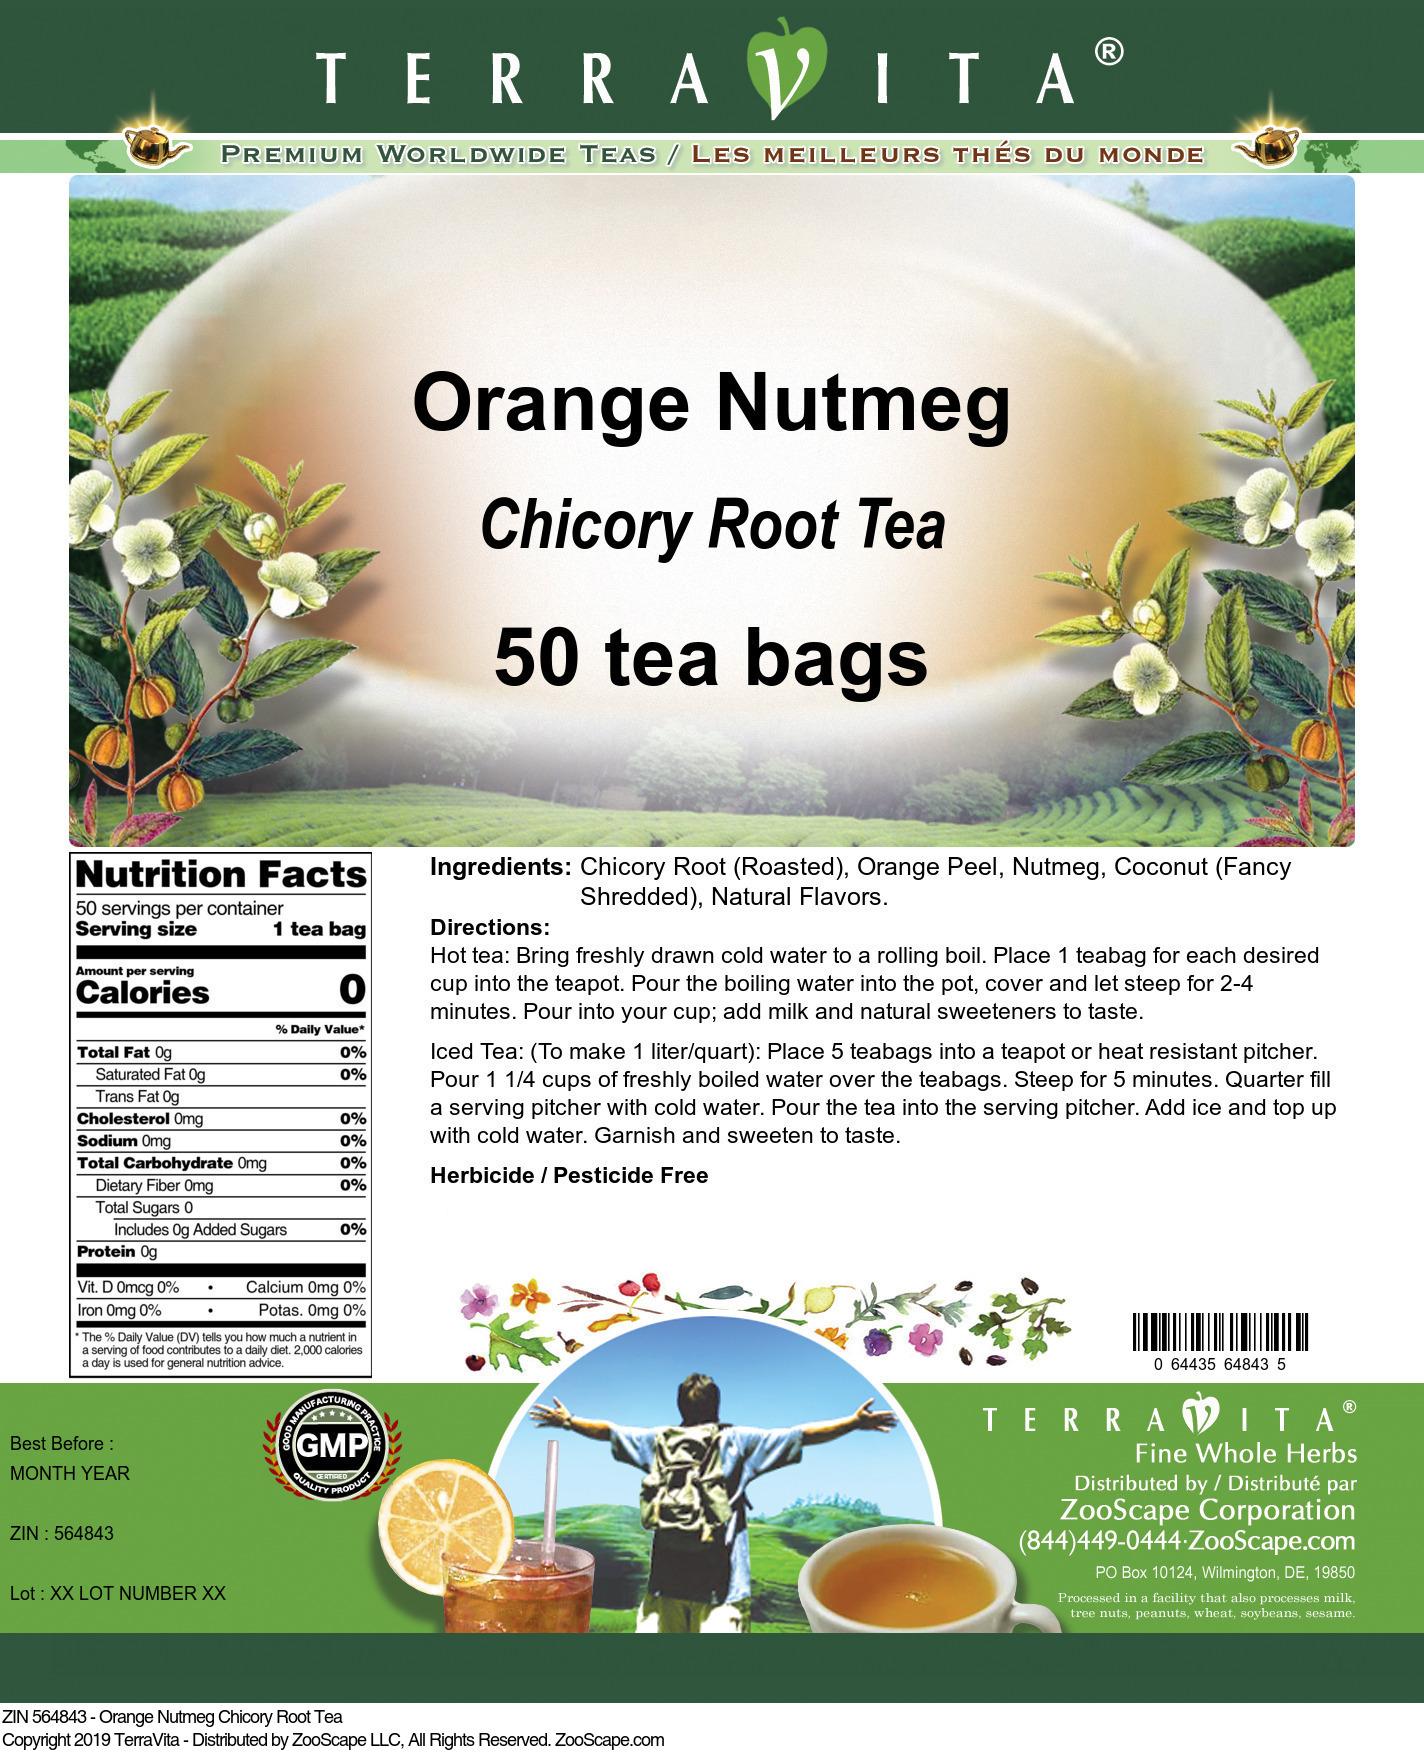 Orange Nutmeg Chicory Root